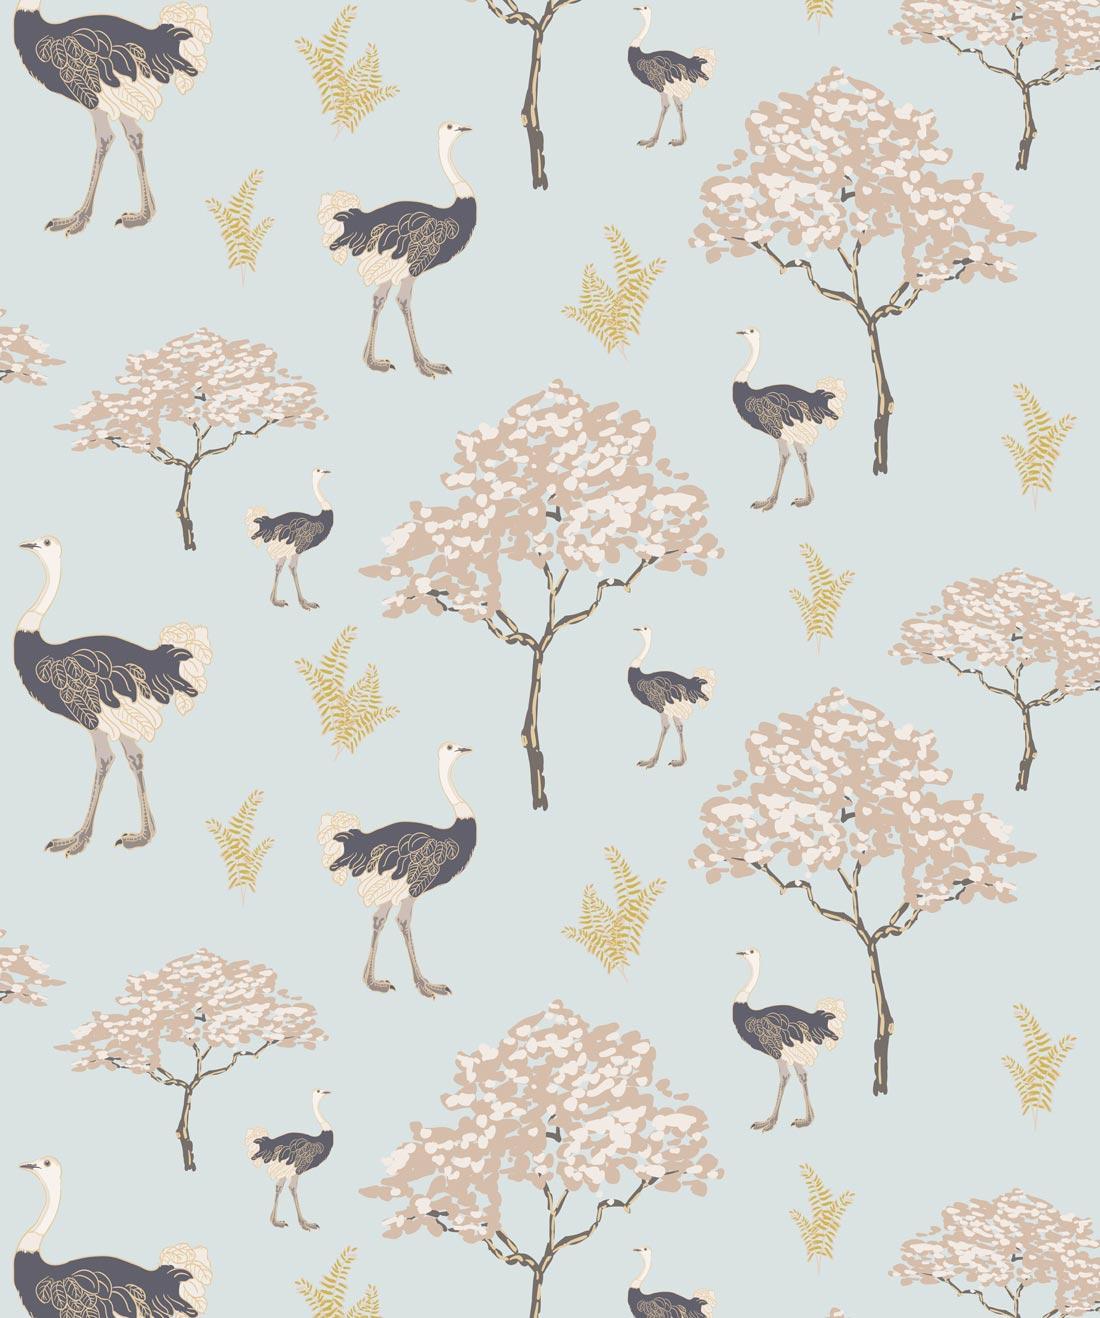 Savanna Ostrich Wallpaper